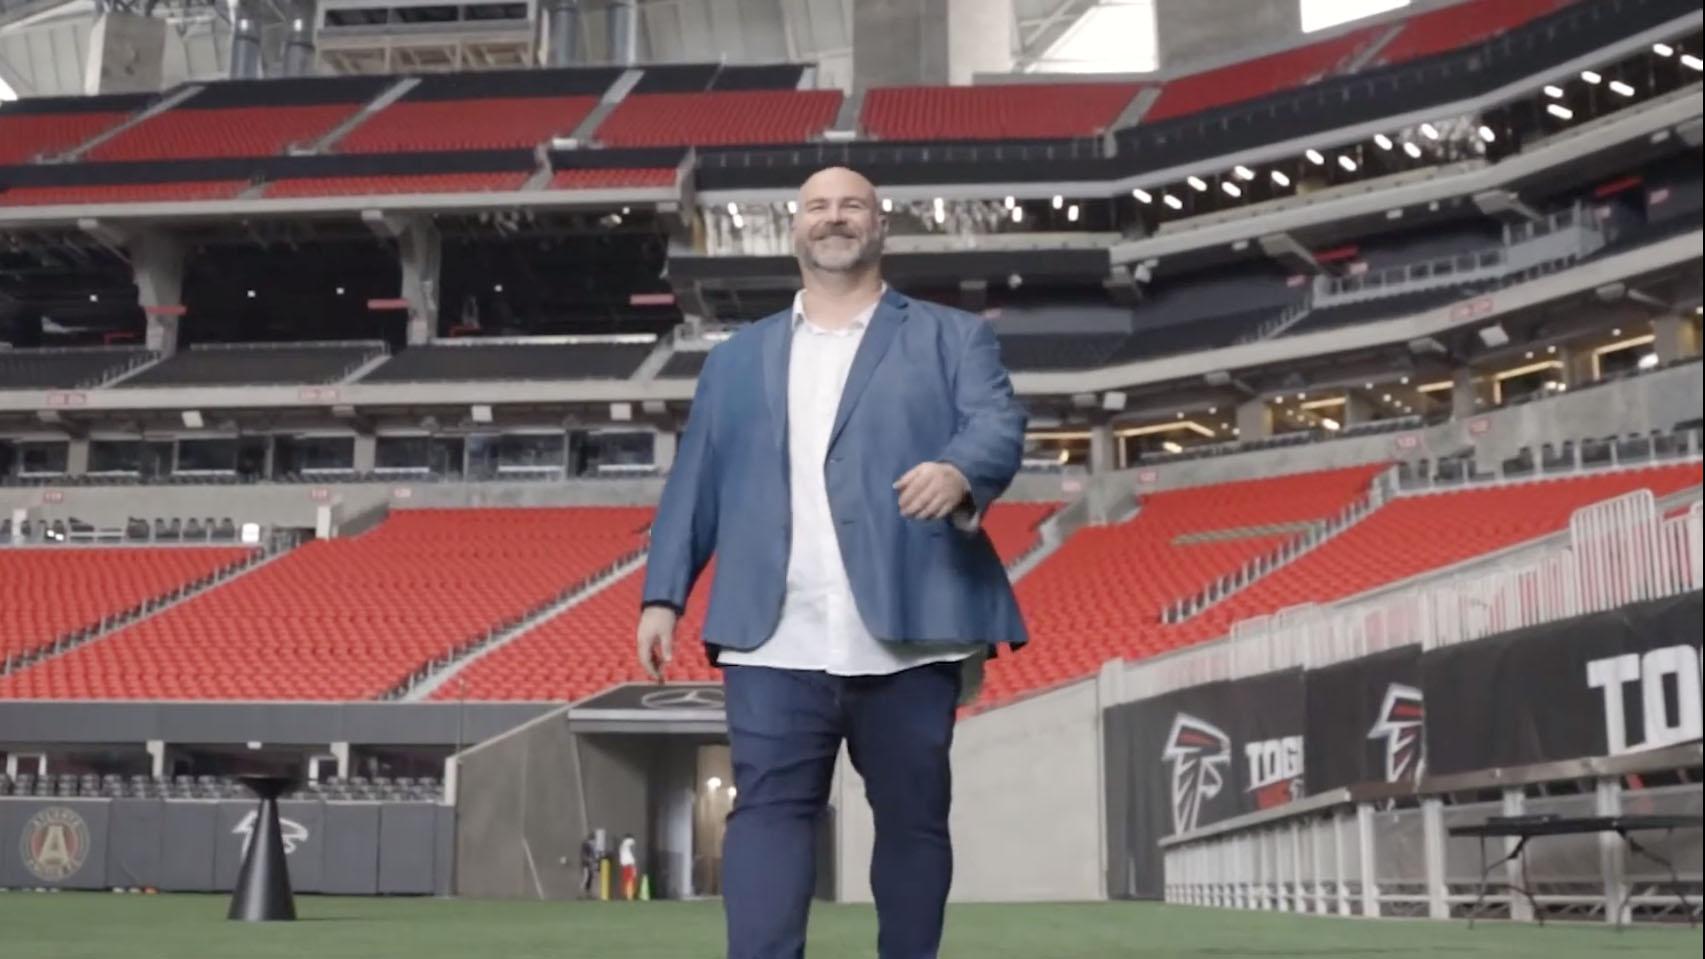 Michael standing in the Atlanta Falcons stadium